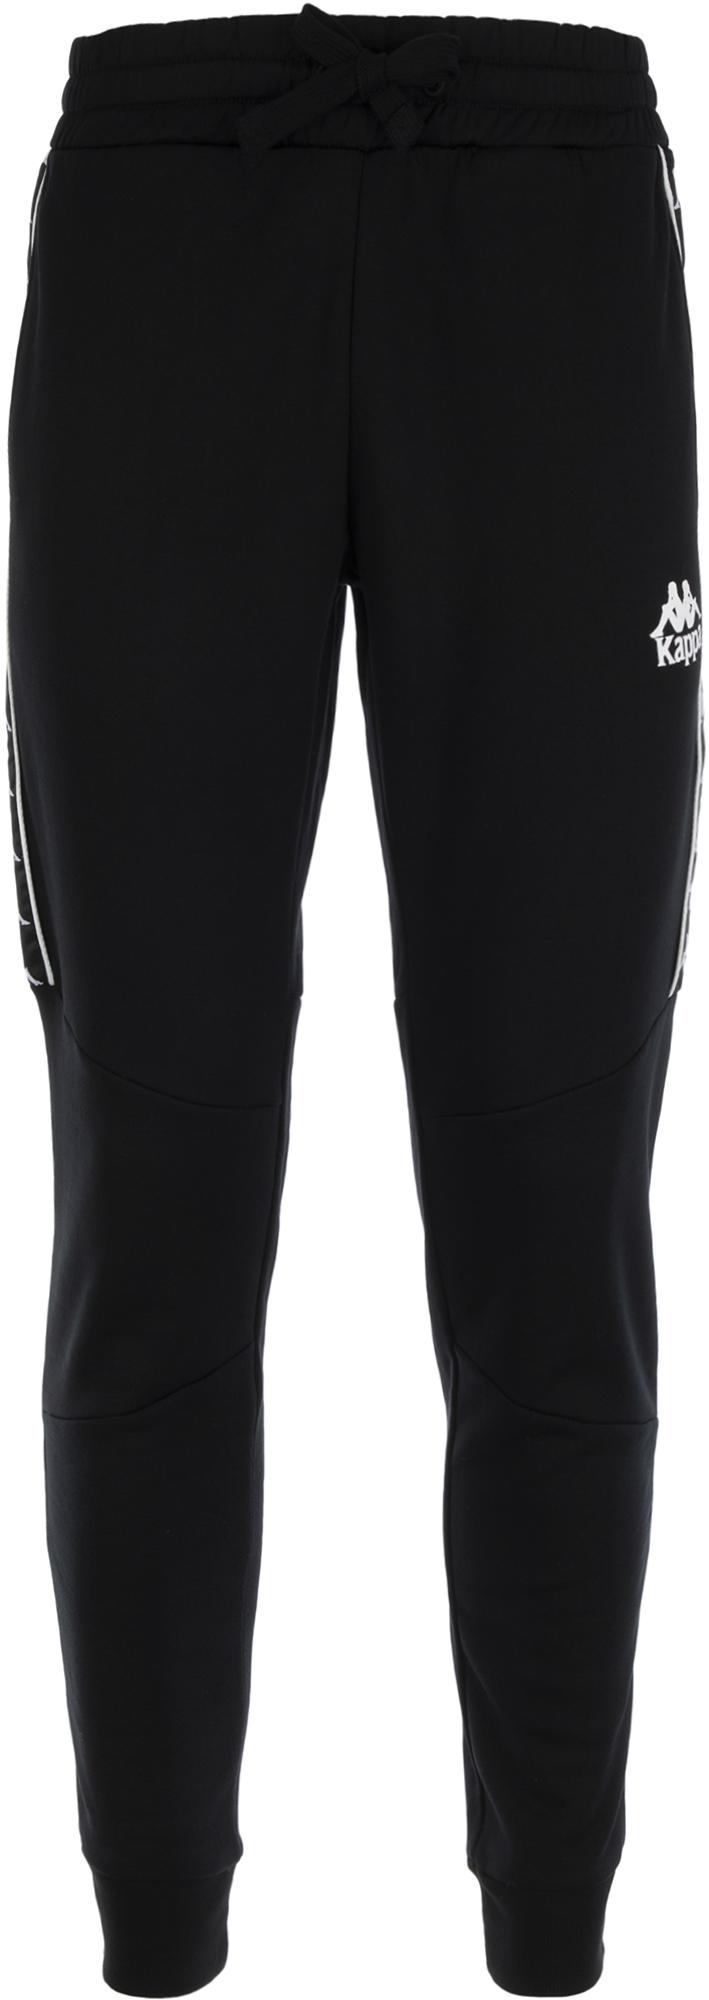 Фото - Kappa Брюки мужские Kappa, размер 52 брюки мужские kappa men s trousers цвет графитовый 304jr00 3a размер xl 52